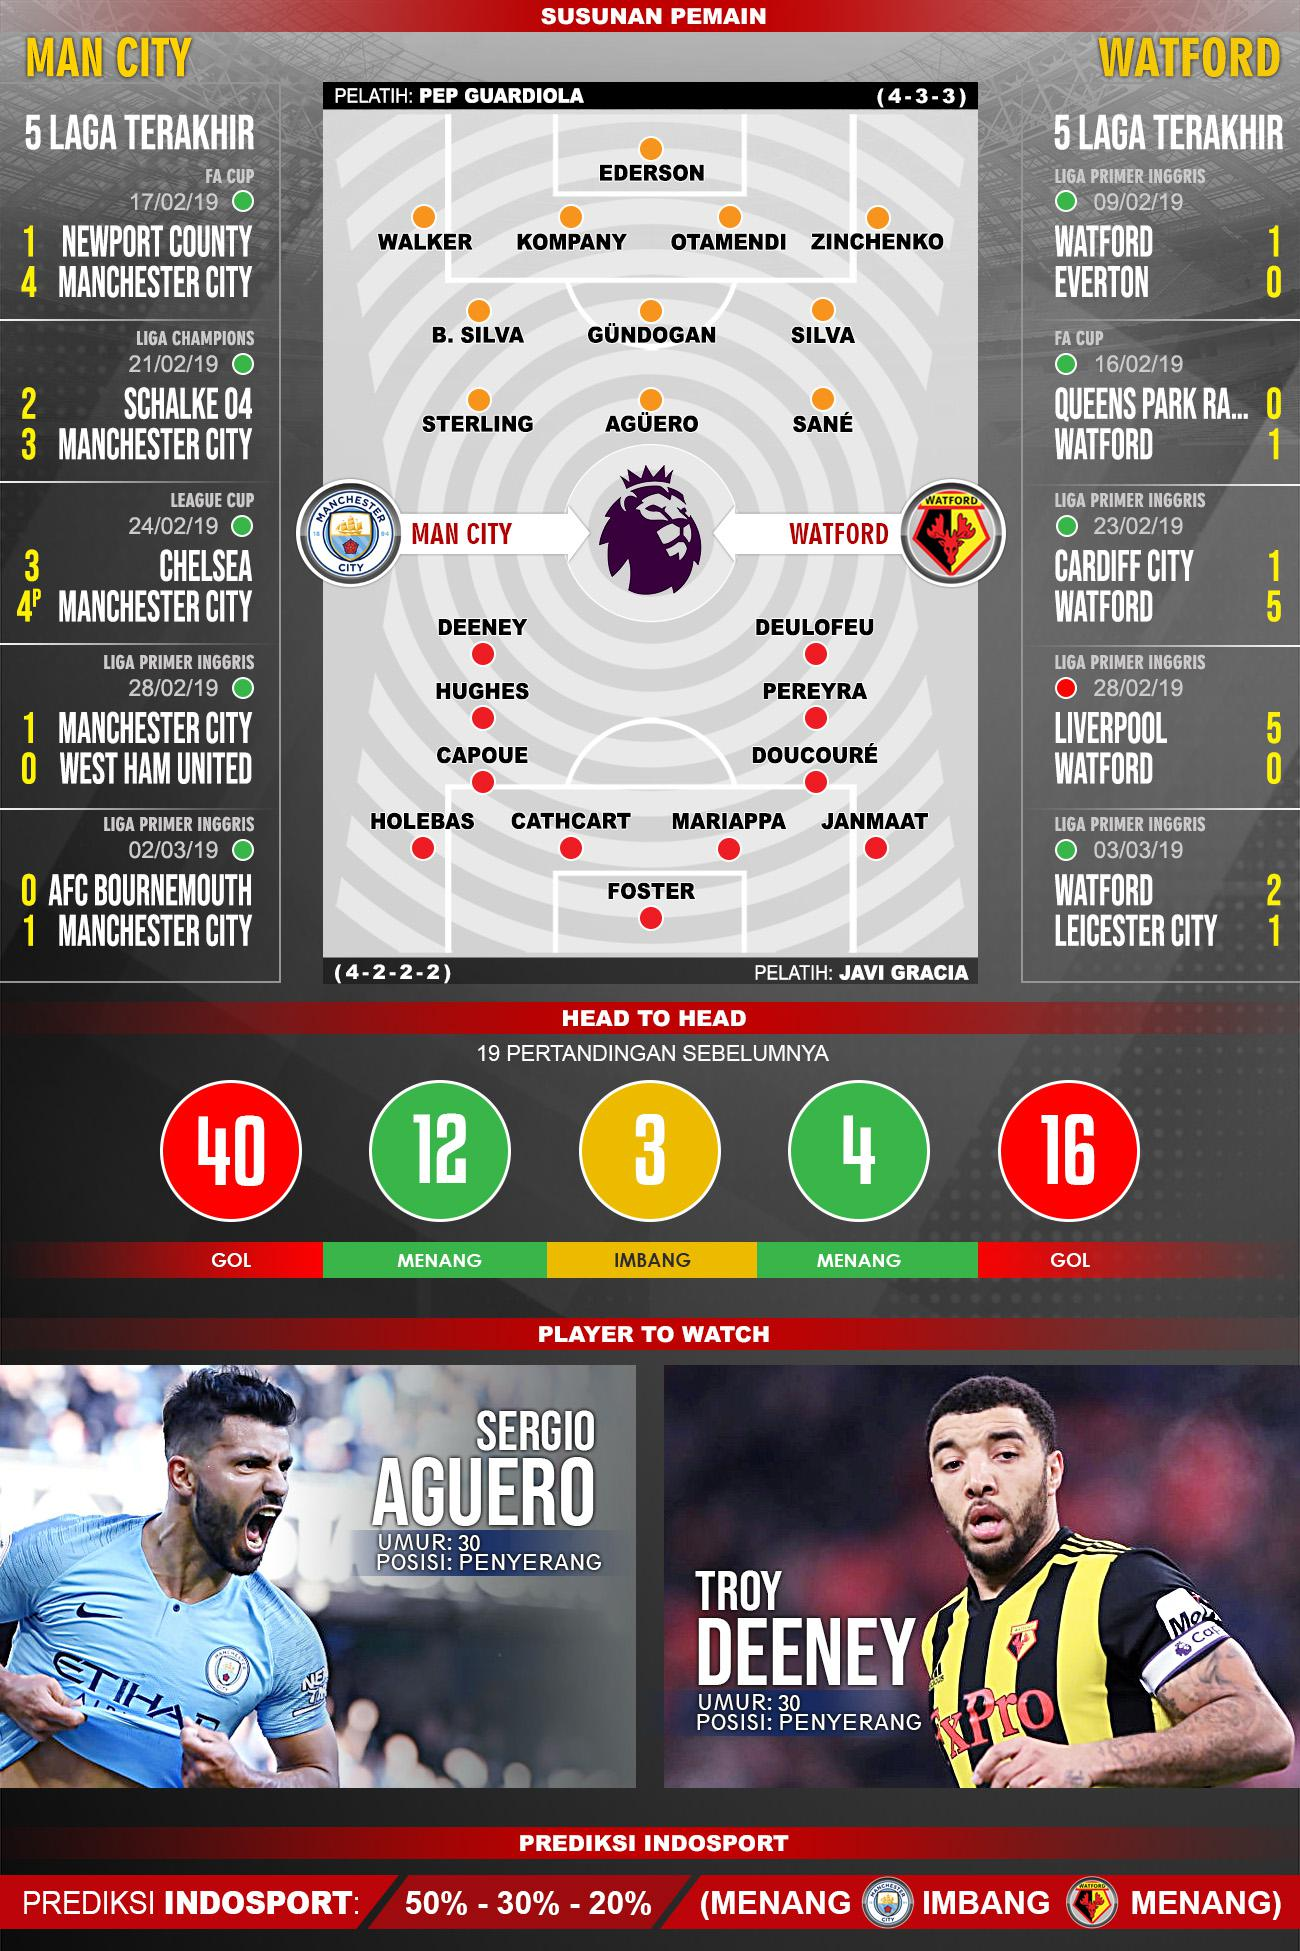 Pertandingan Manchester City vs Watford. Copyright: Indosport.com